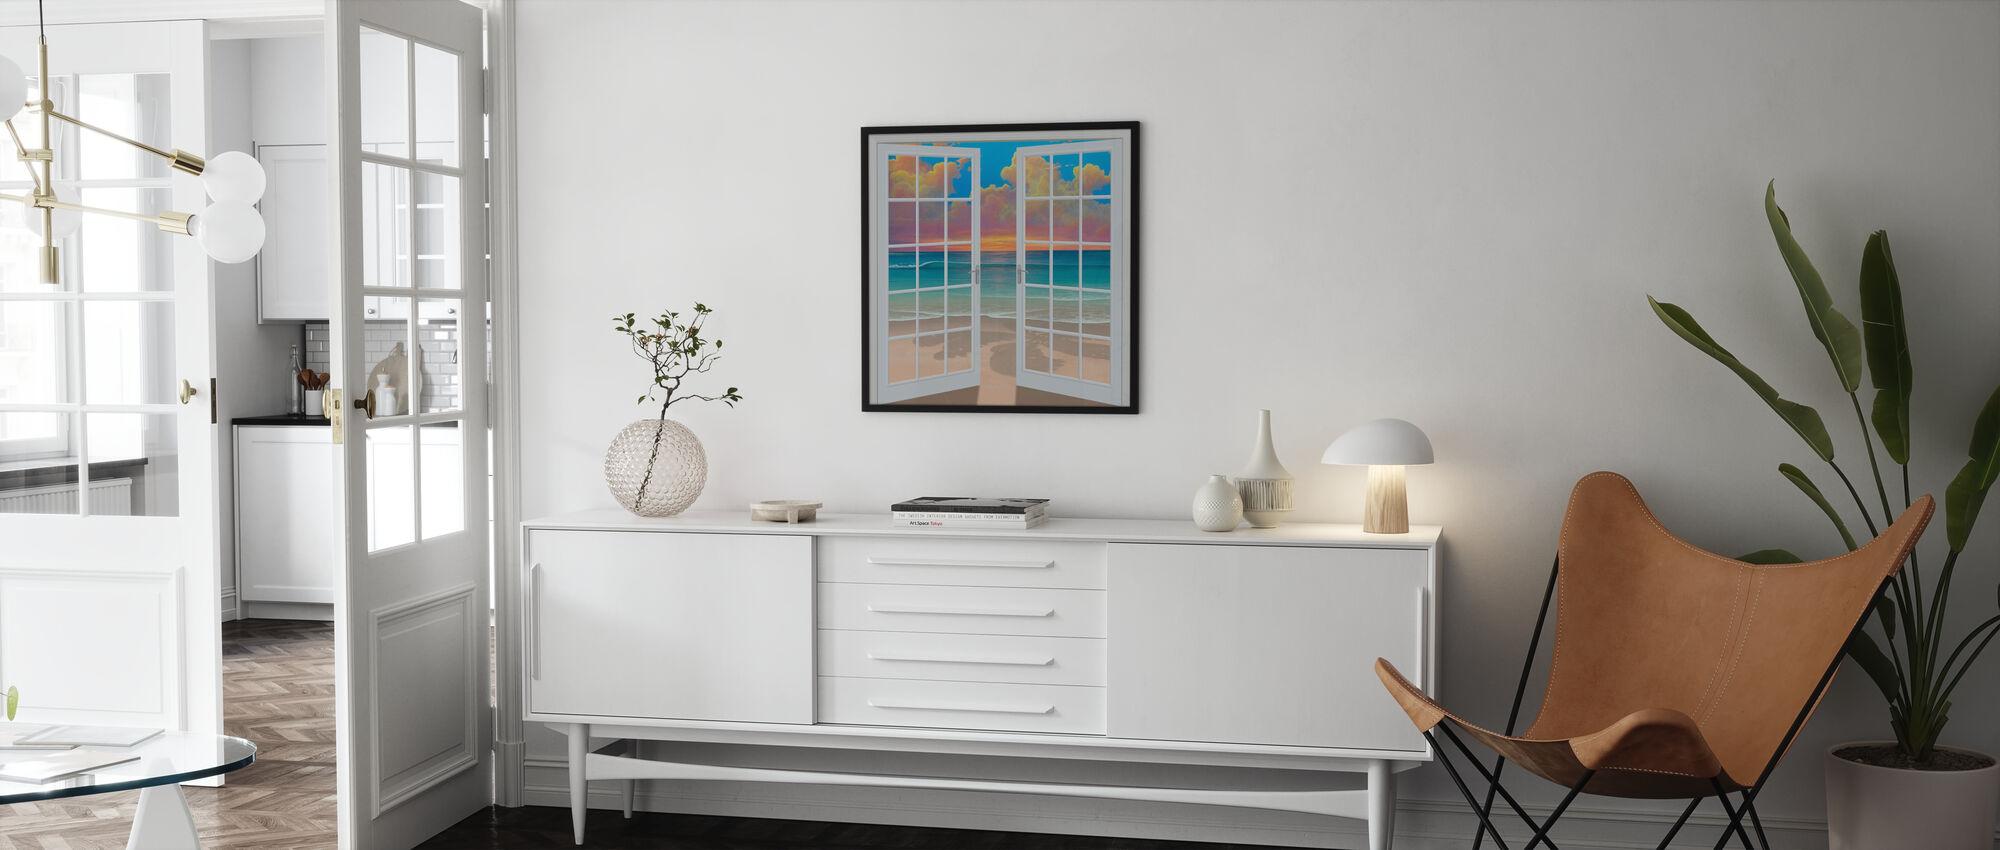 Sunset Through Window - Poster - Living Room